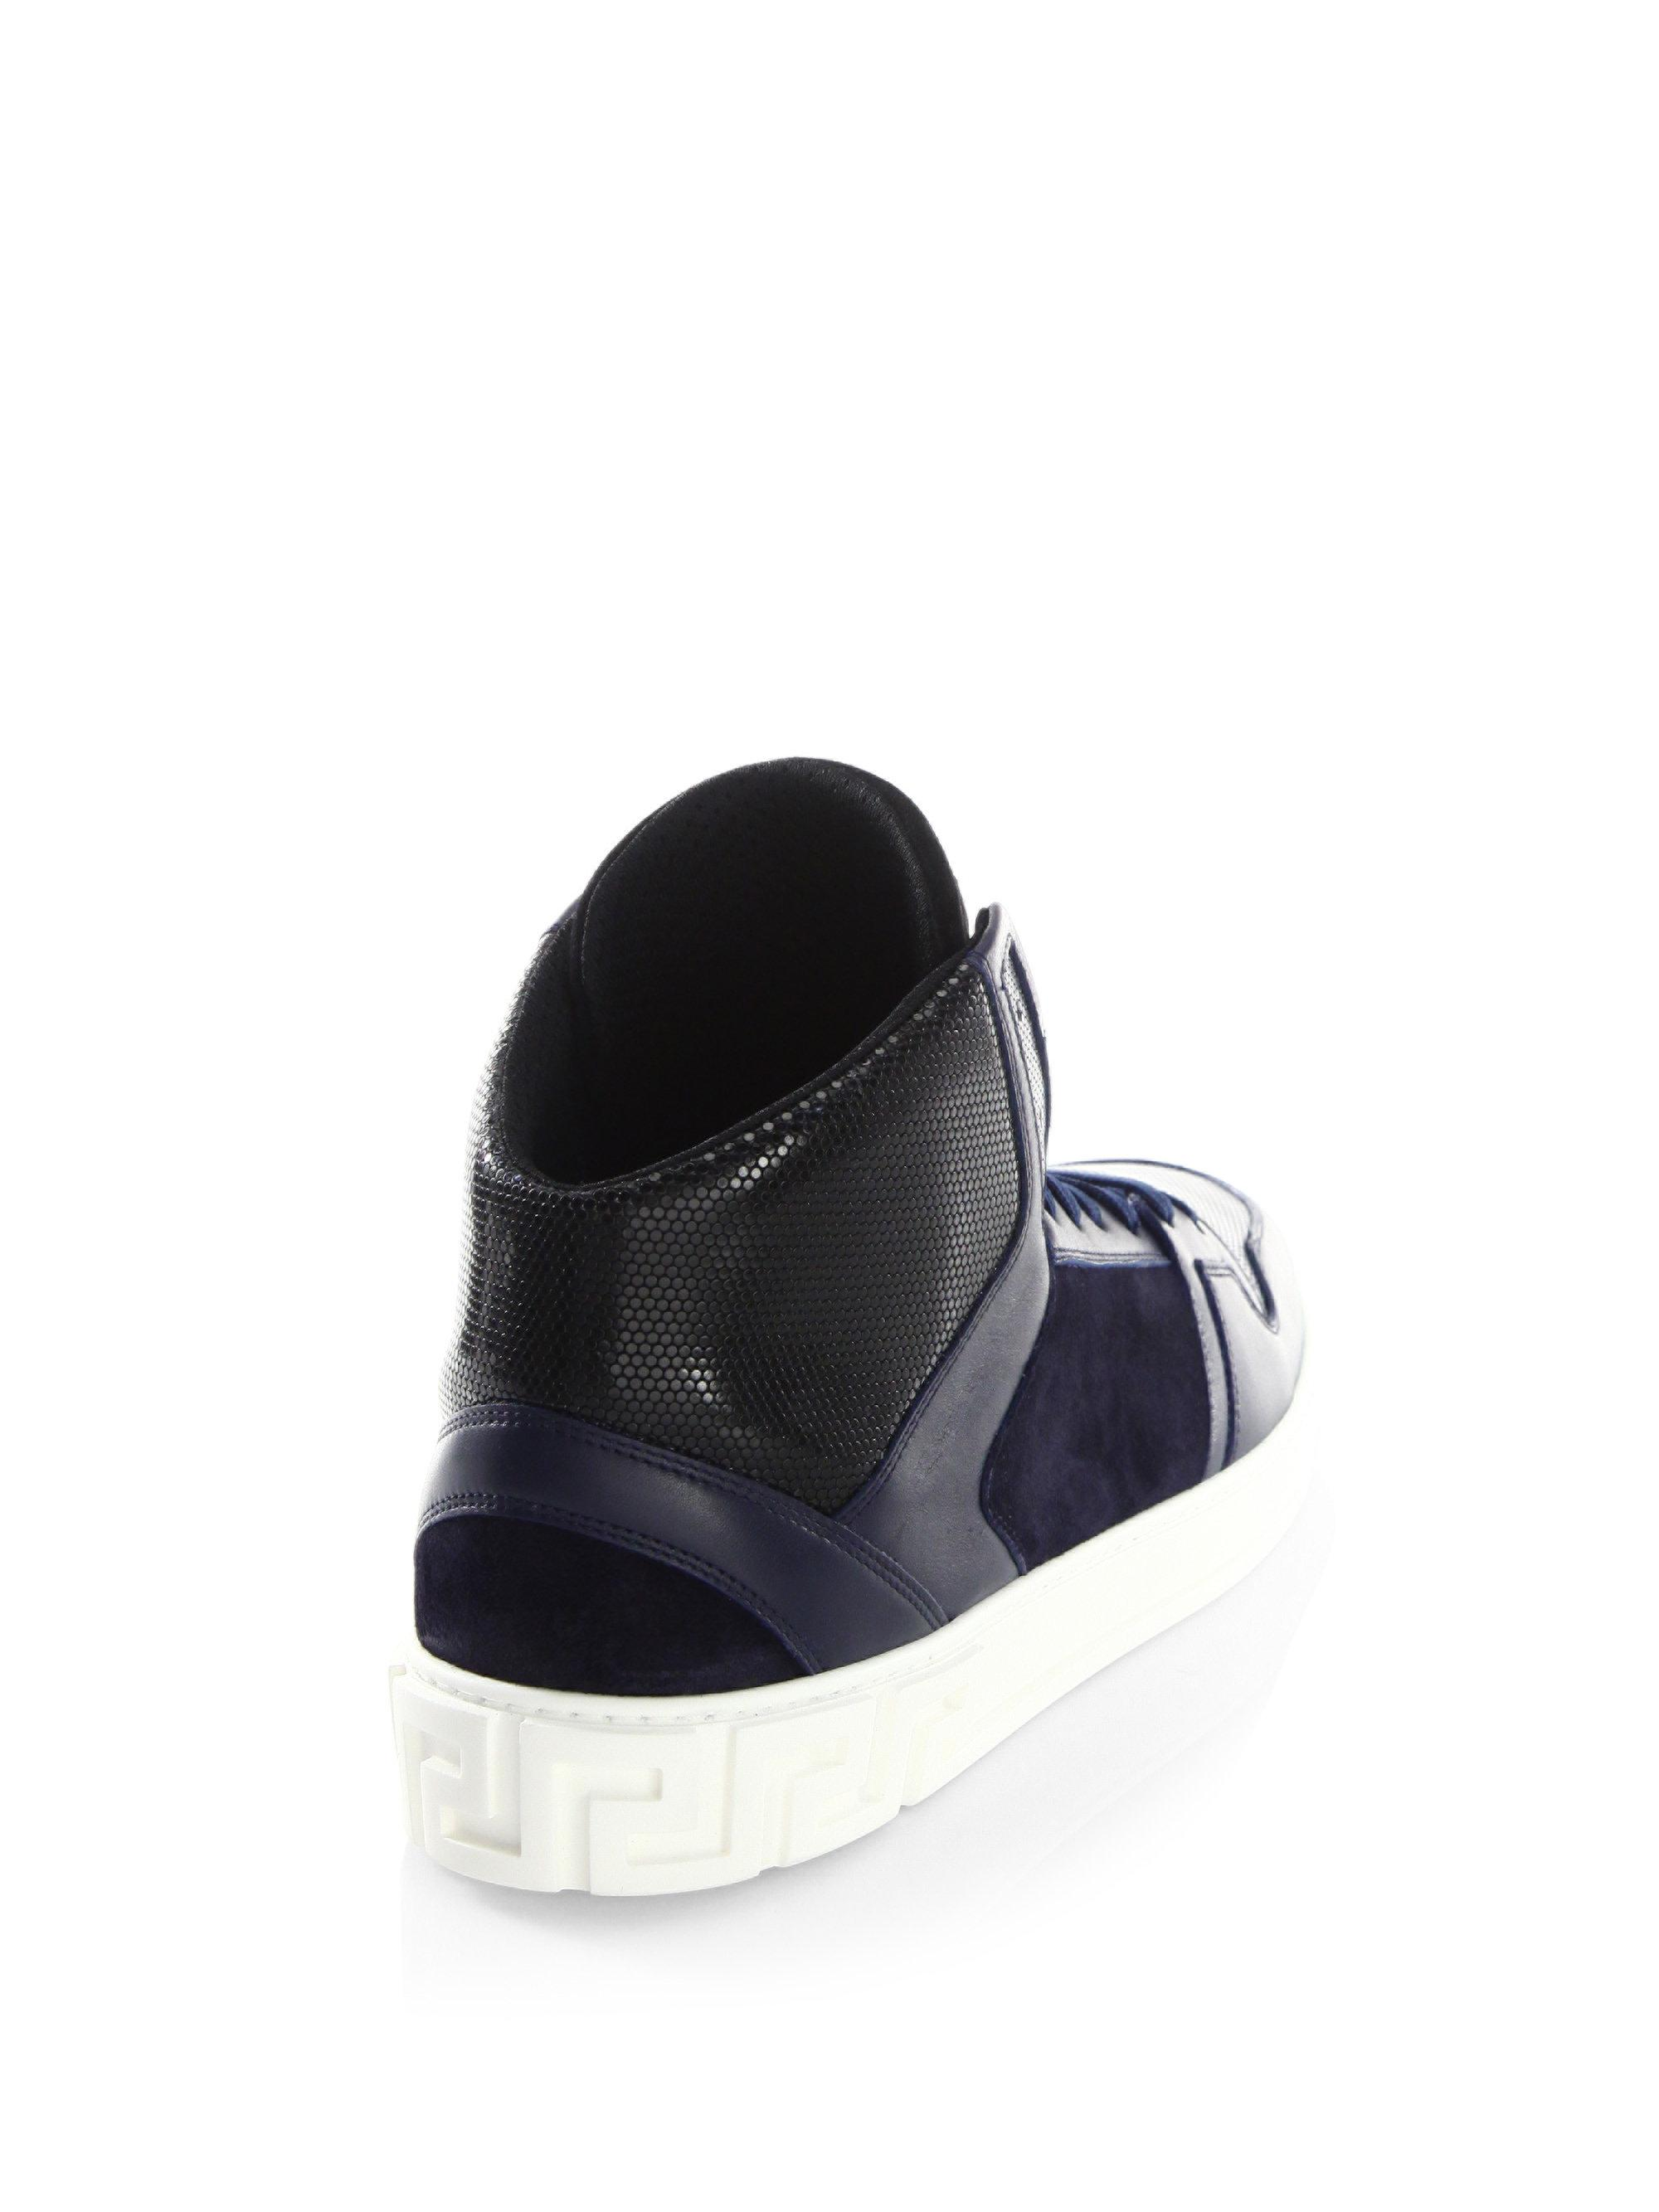 VERSACE Stylish High-Top Sneakers fcQmutRBIE